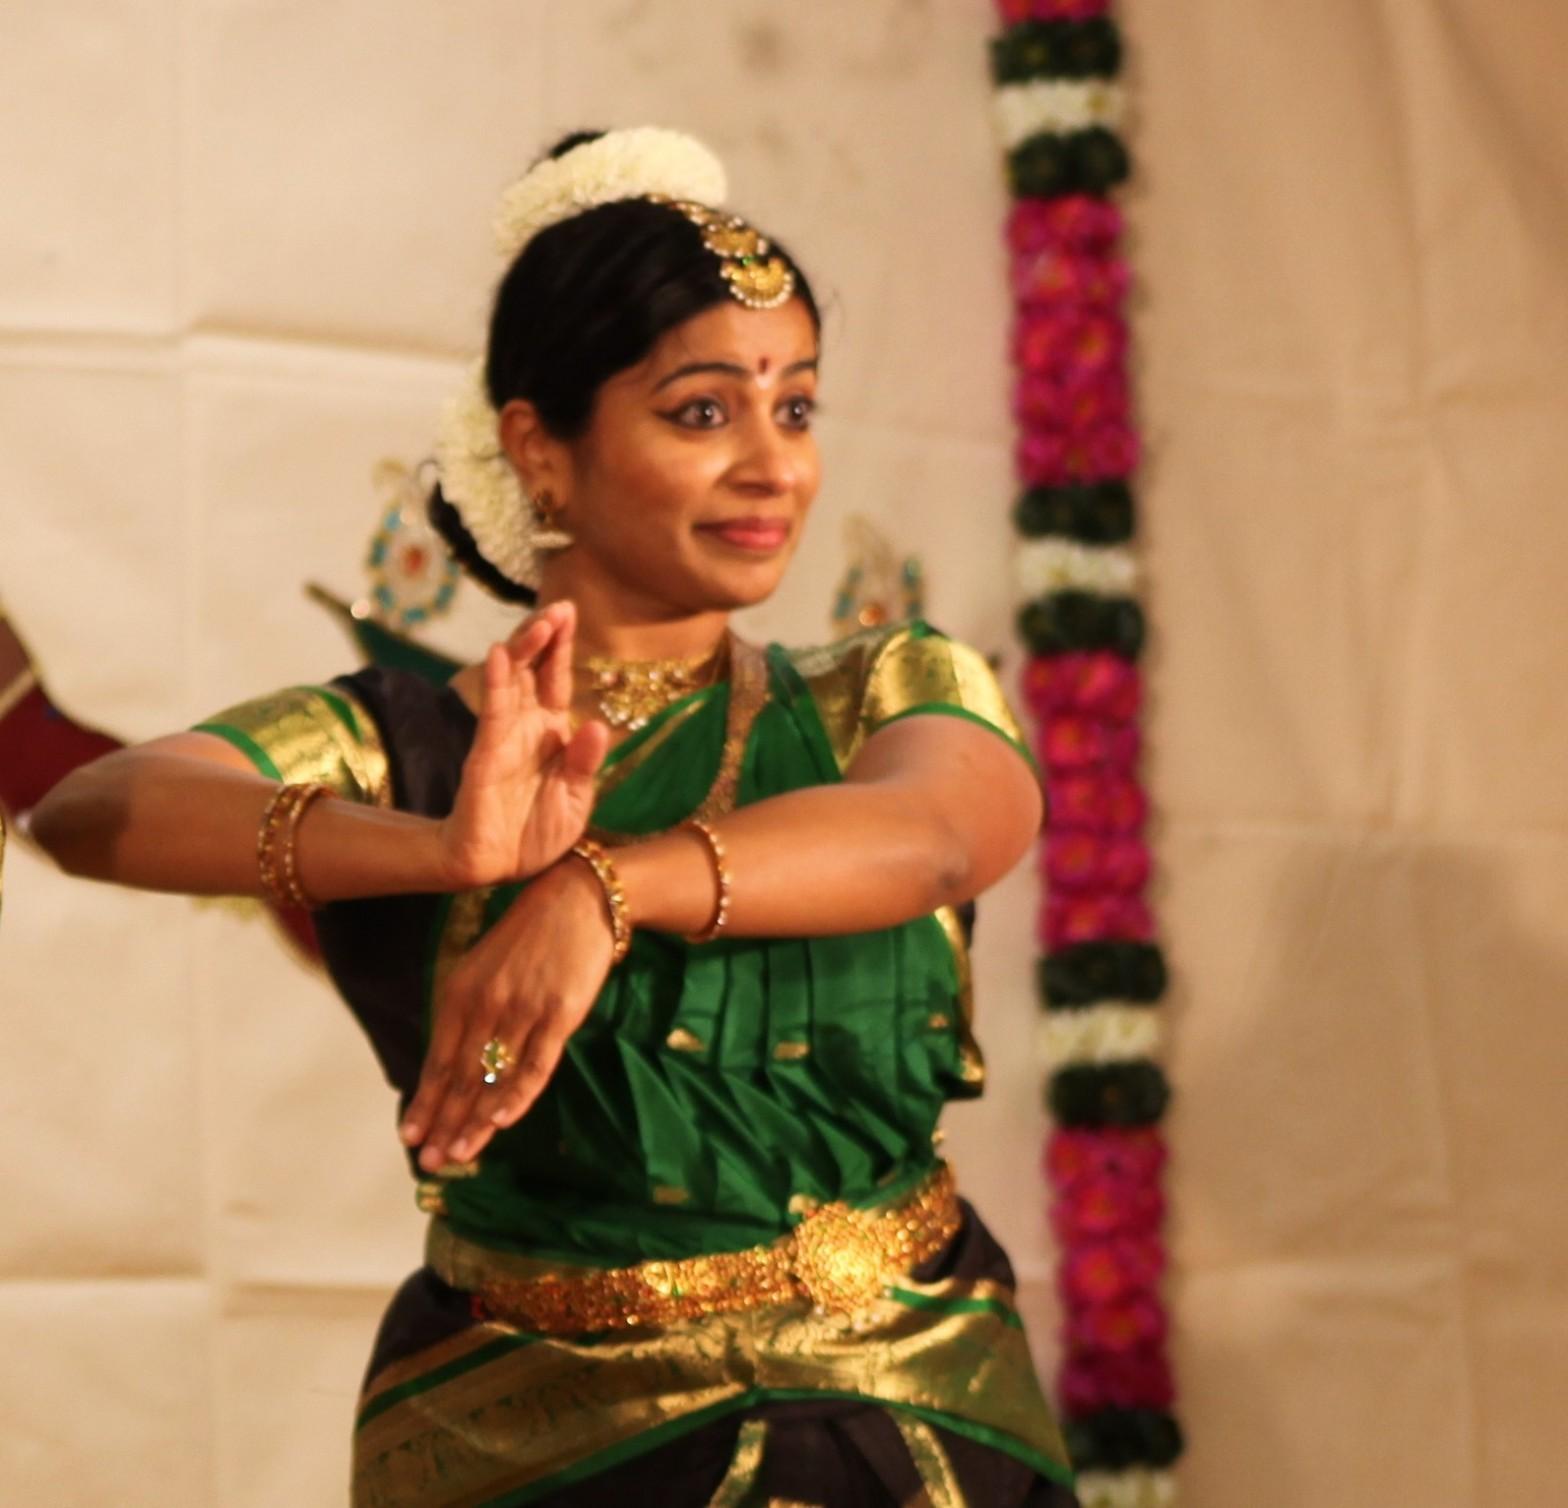 shanthi ashok bharatnatyam nataraja classical dance dmv area